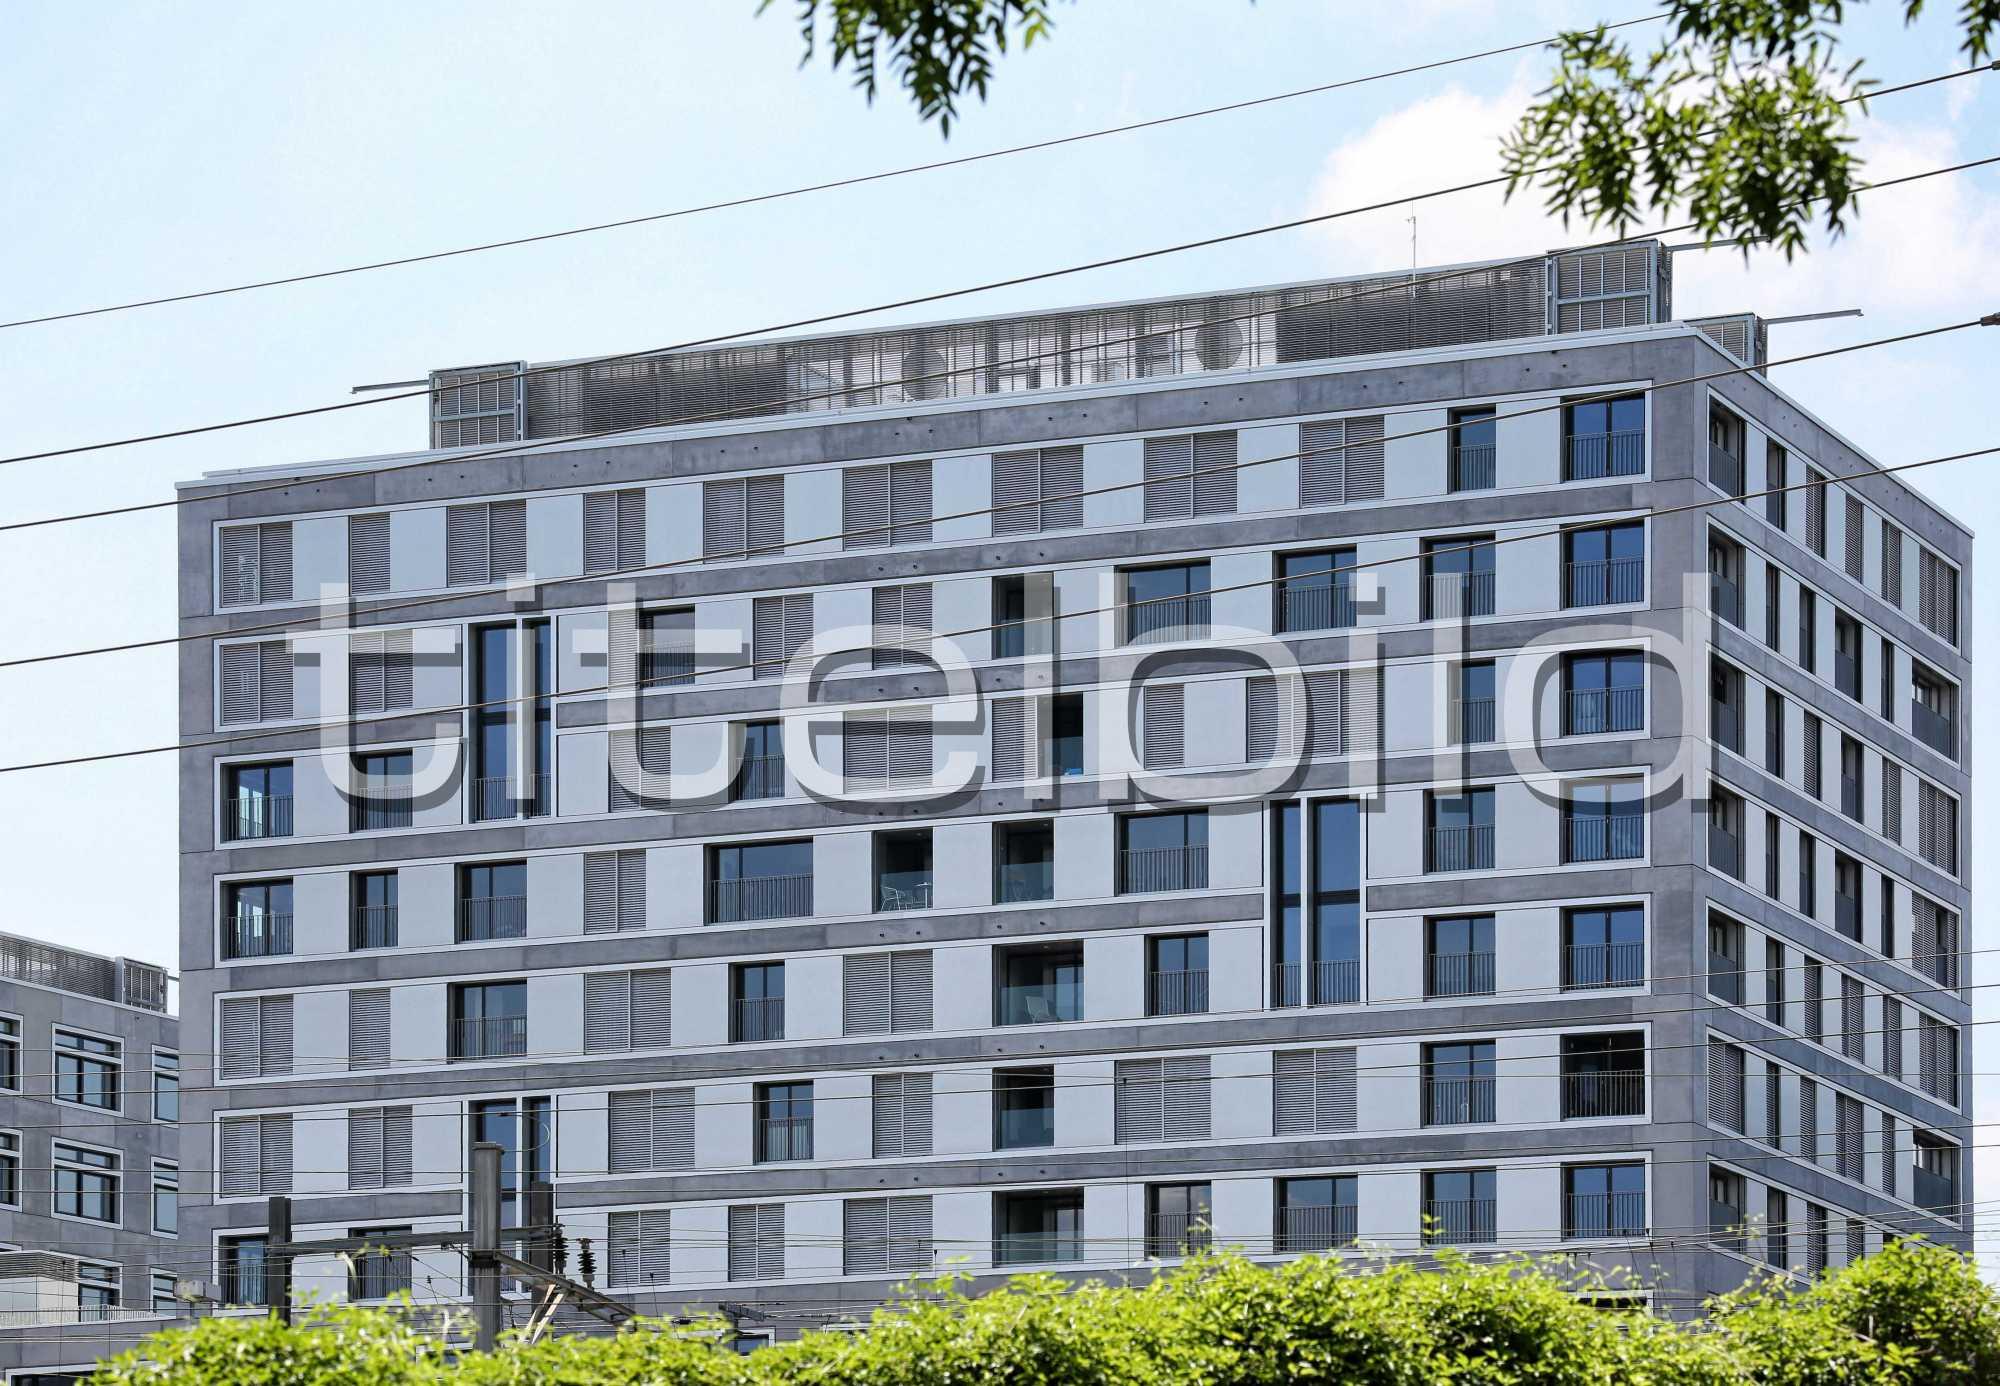 Projektbild-Nr. 3: Europaallee Haus H, 25hours hotel, GUSTAV Residenz